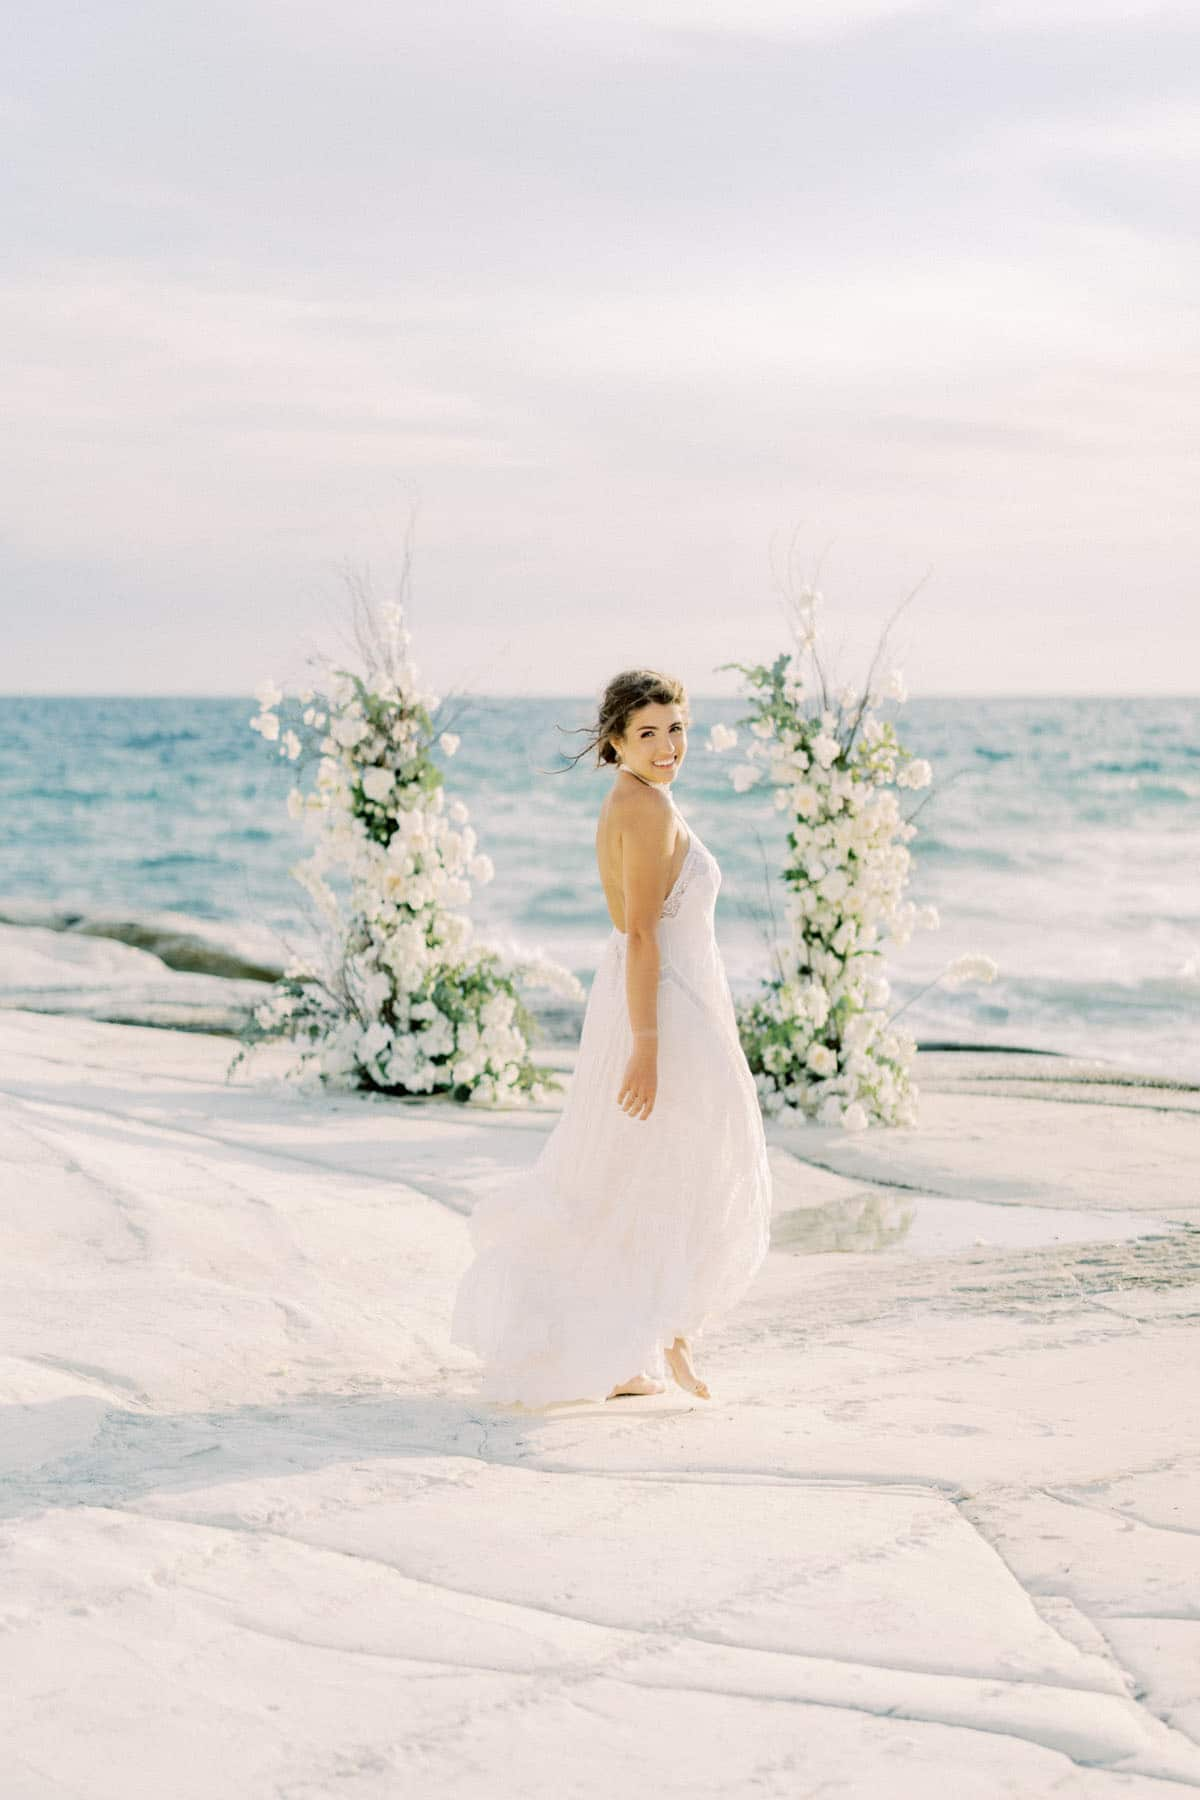 Limassol-whiterocks-wedding-beach-cyprus